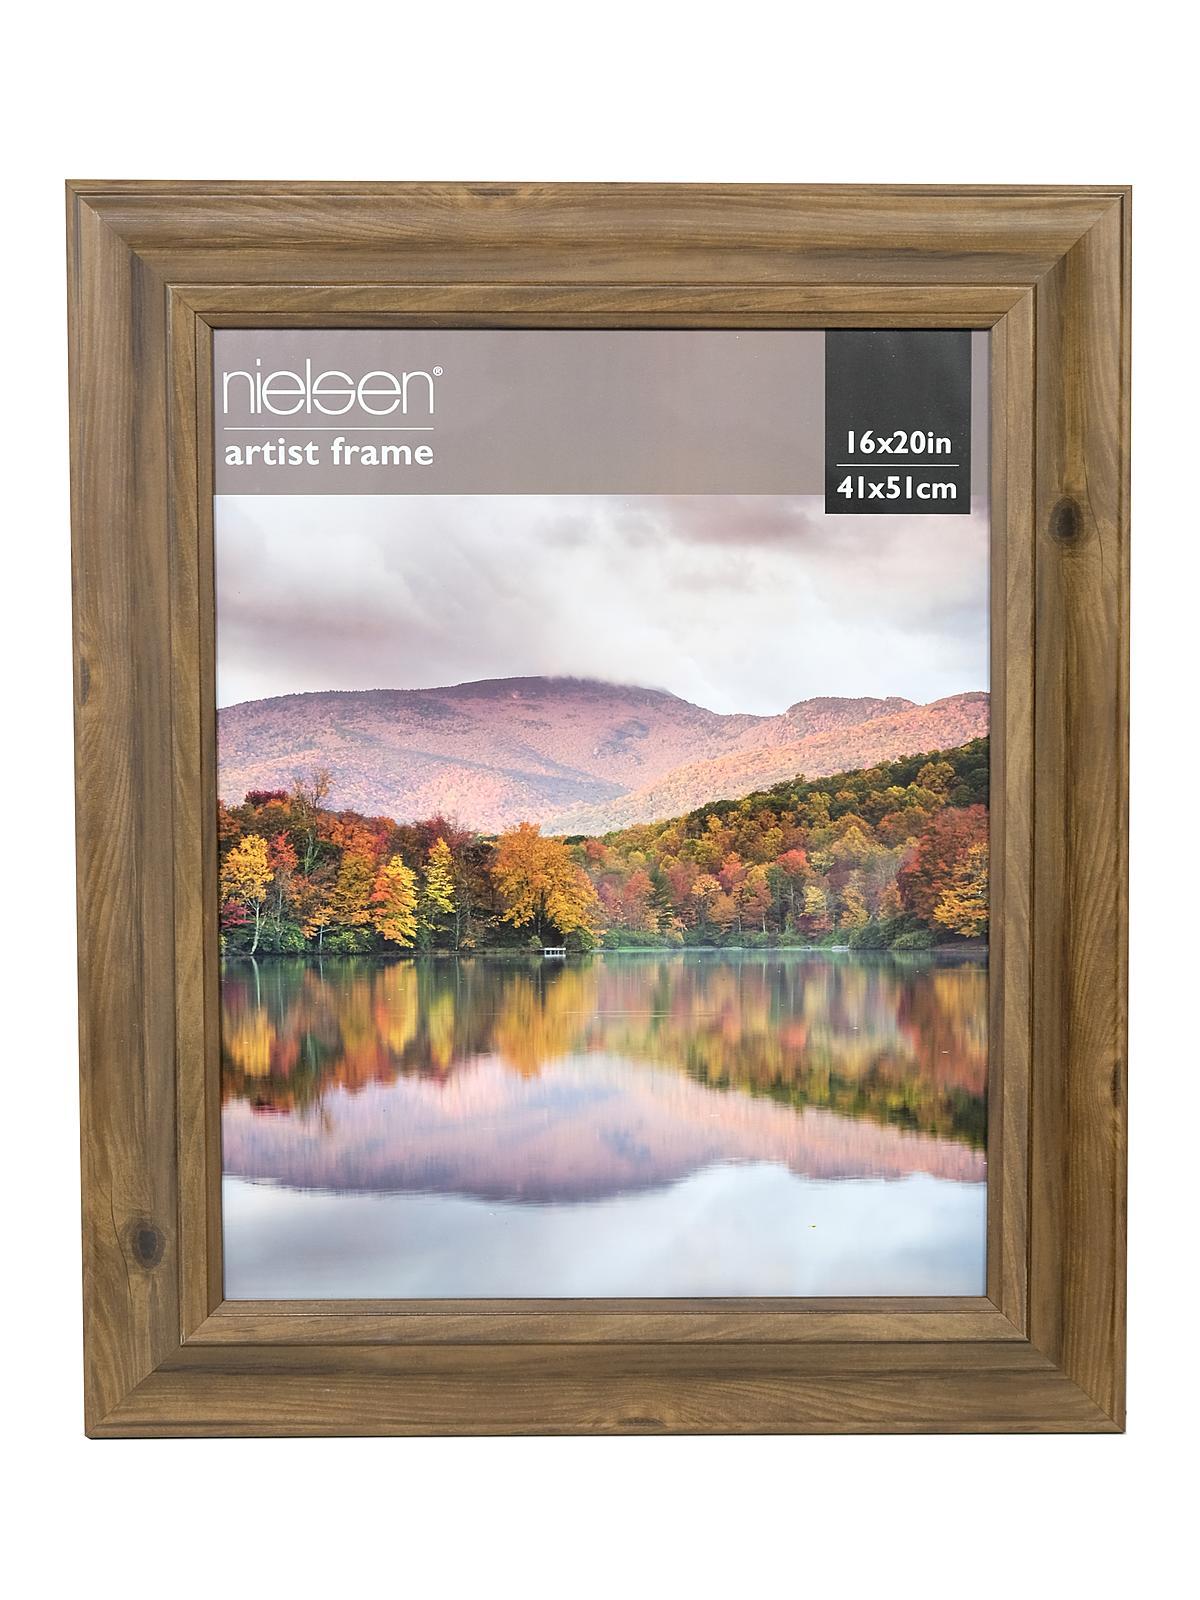 Nielsen Bainbridge Barnwood Collection Frames